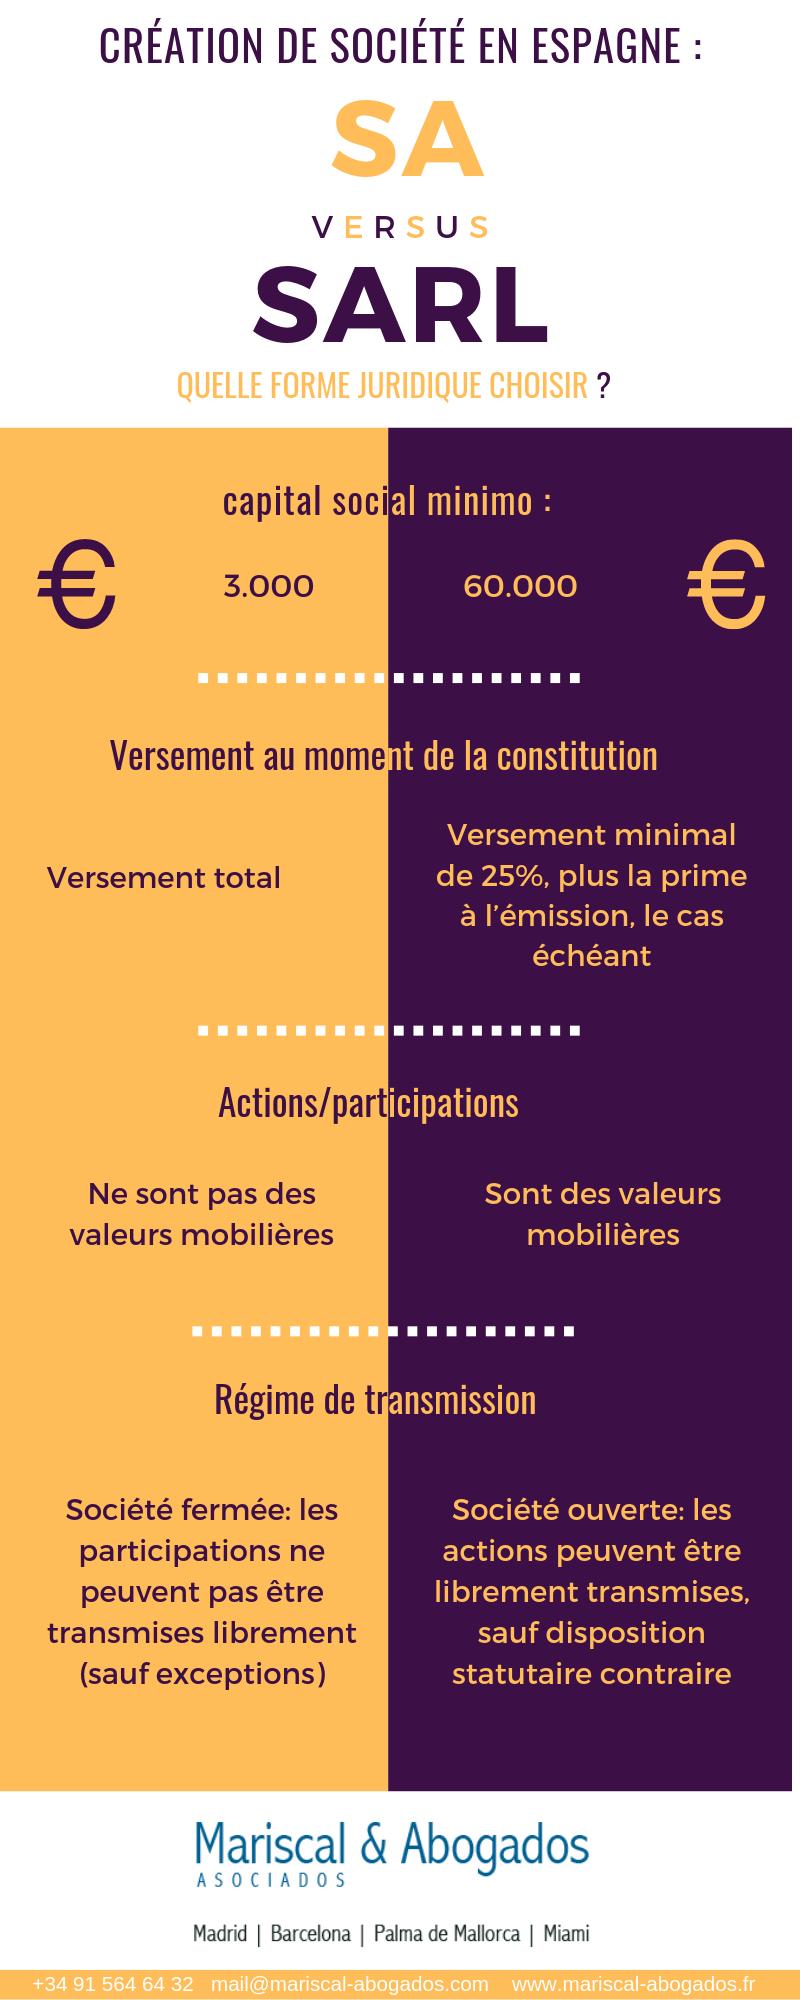 90 2016 Crétation de société en Espagne _ SA vs SARL